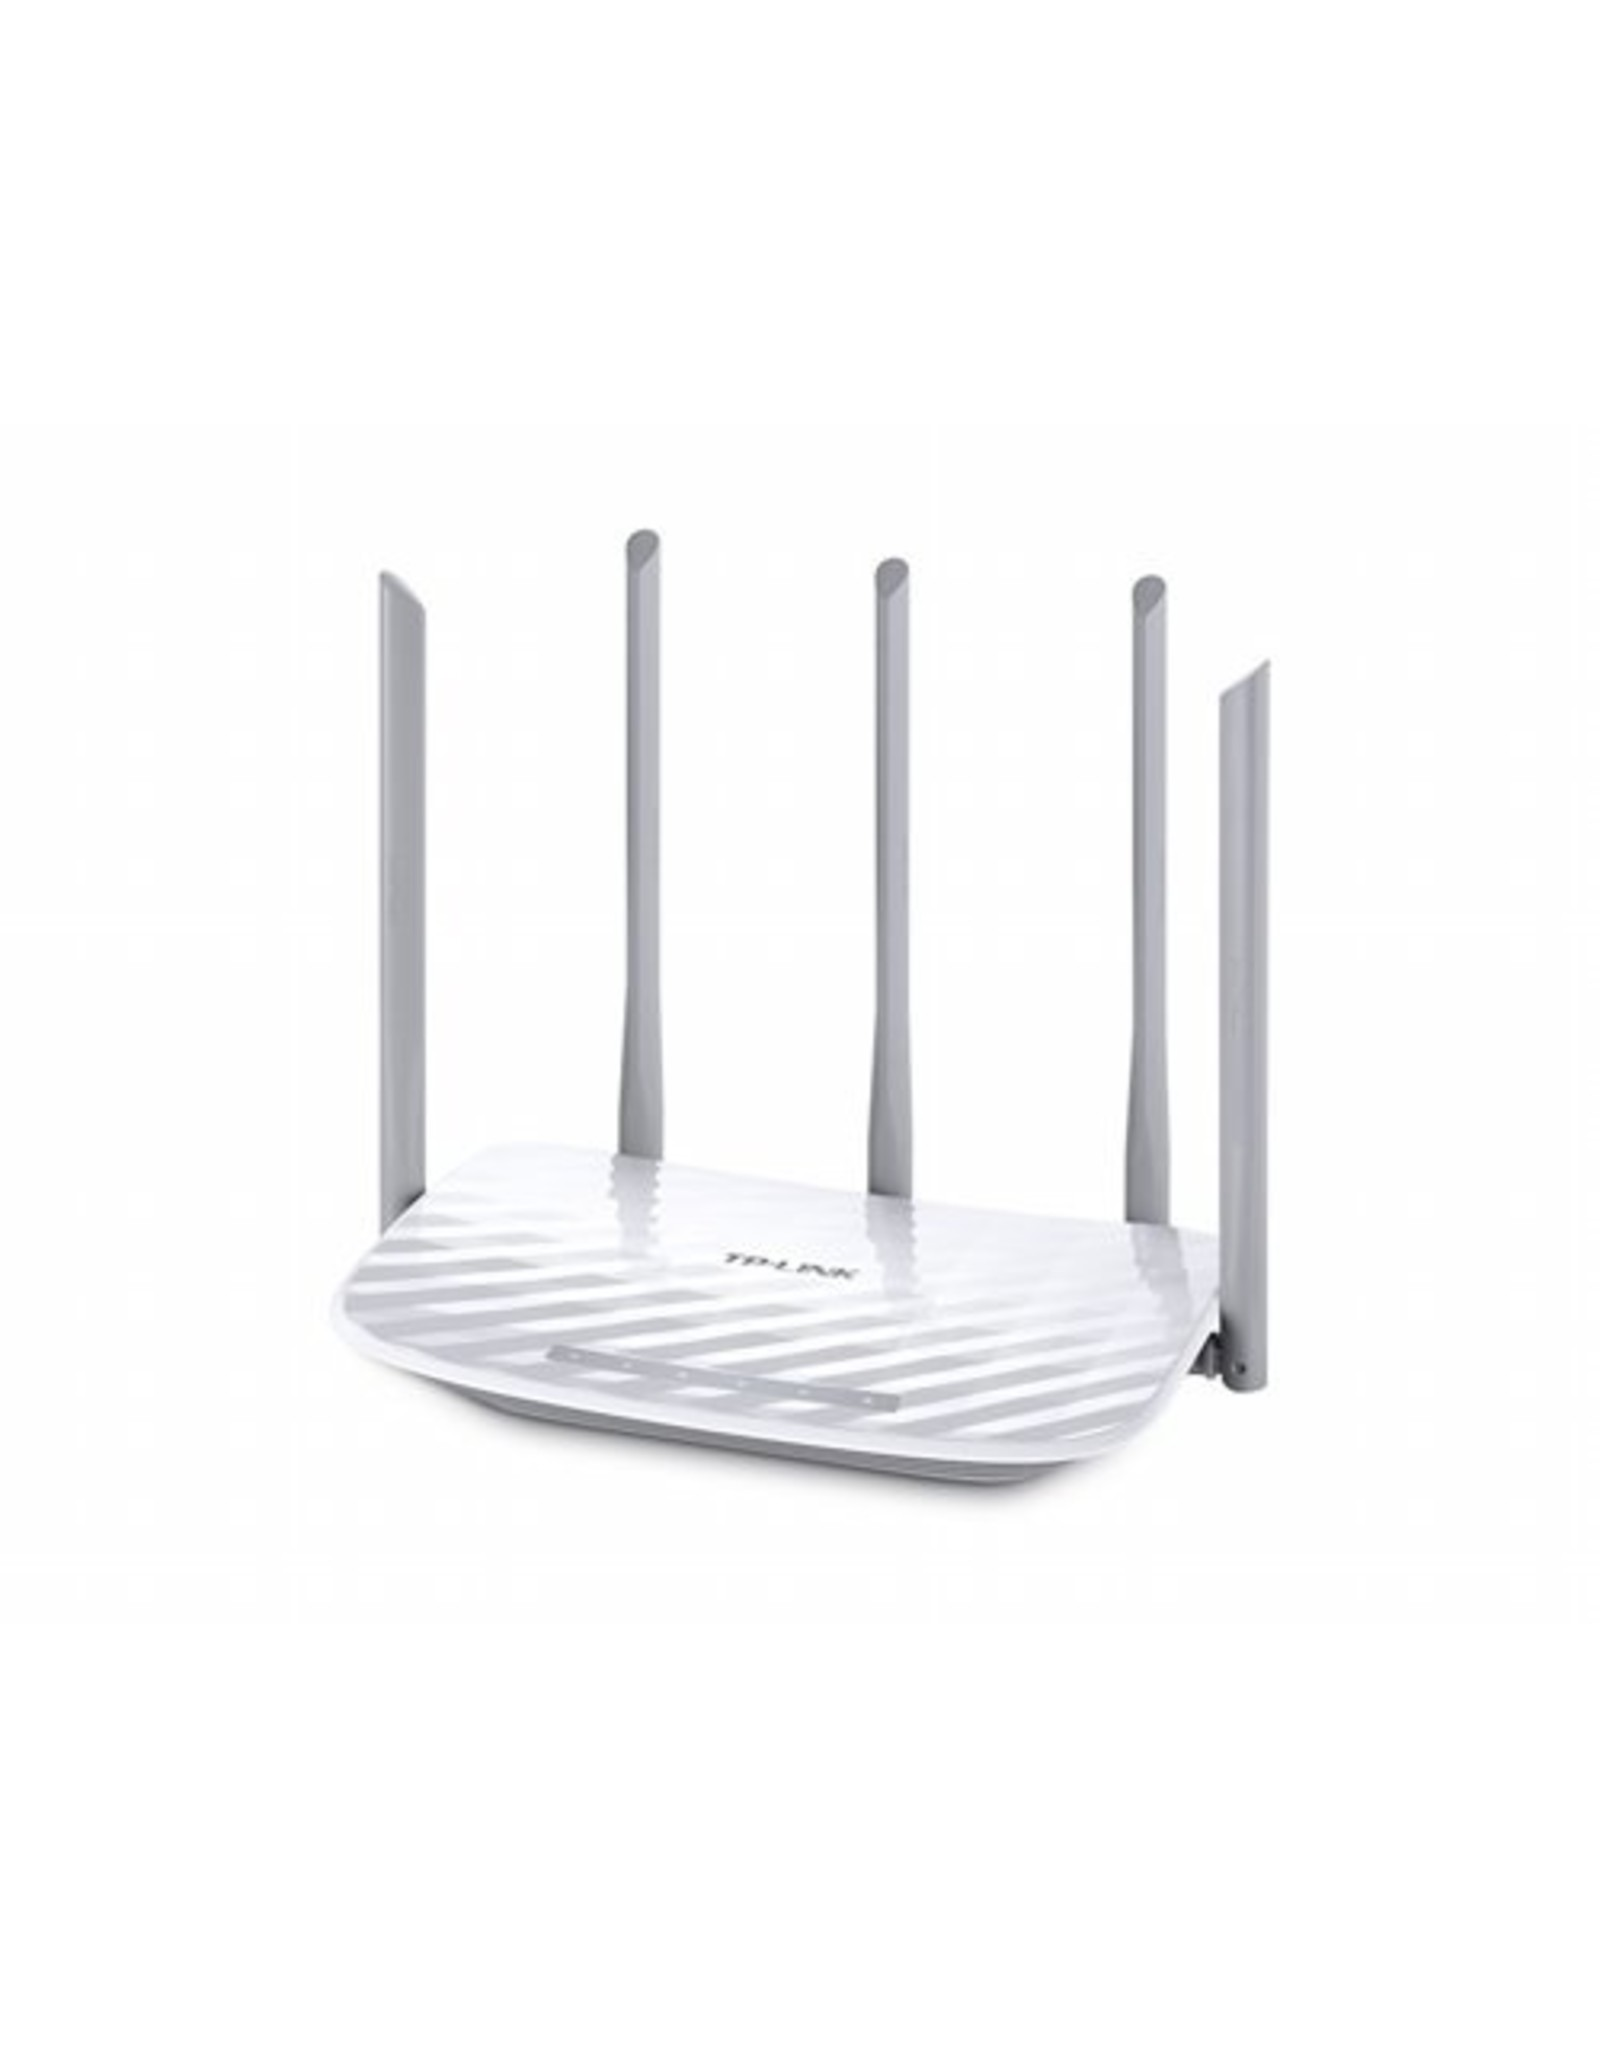 TP-Link ArcherC60 AC1350 Wireless Router (refurbished)